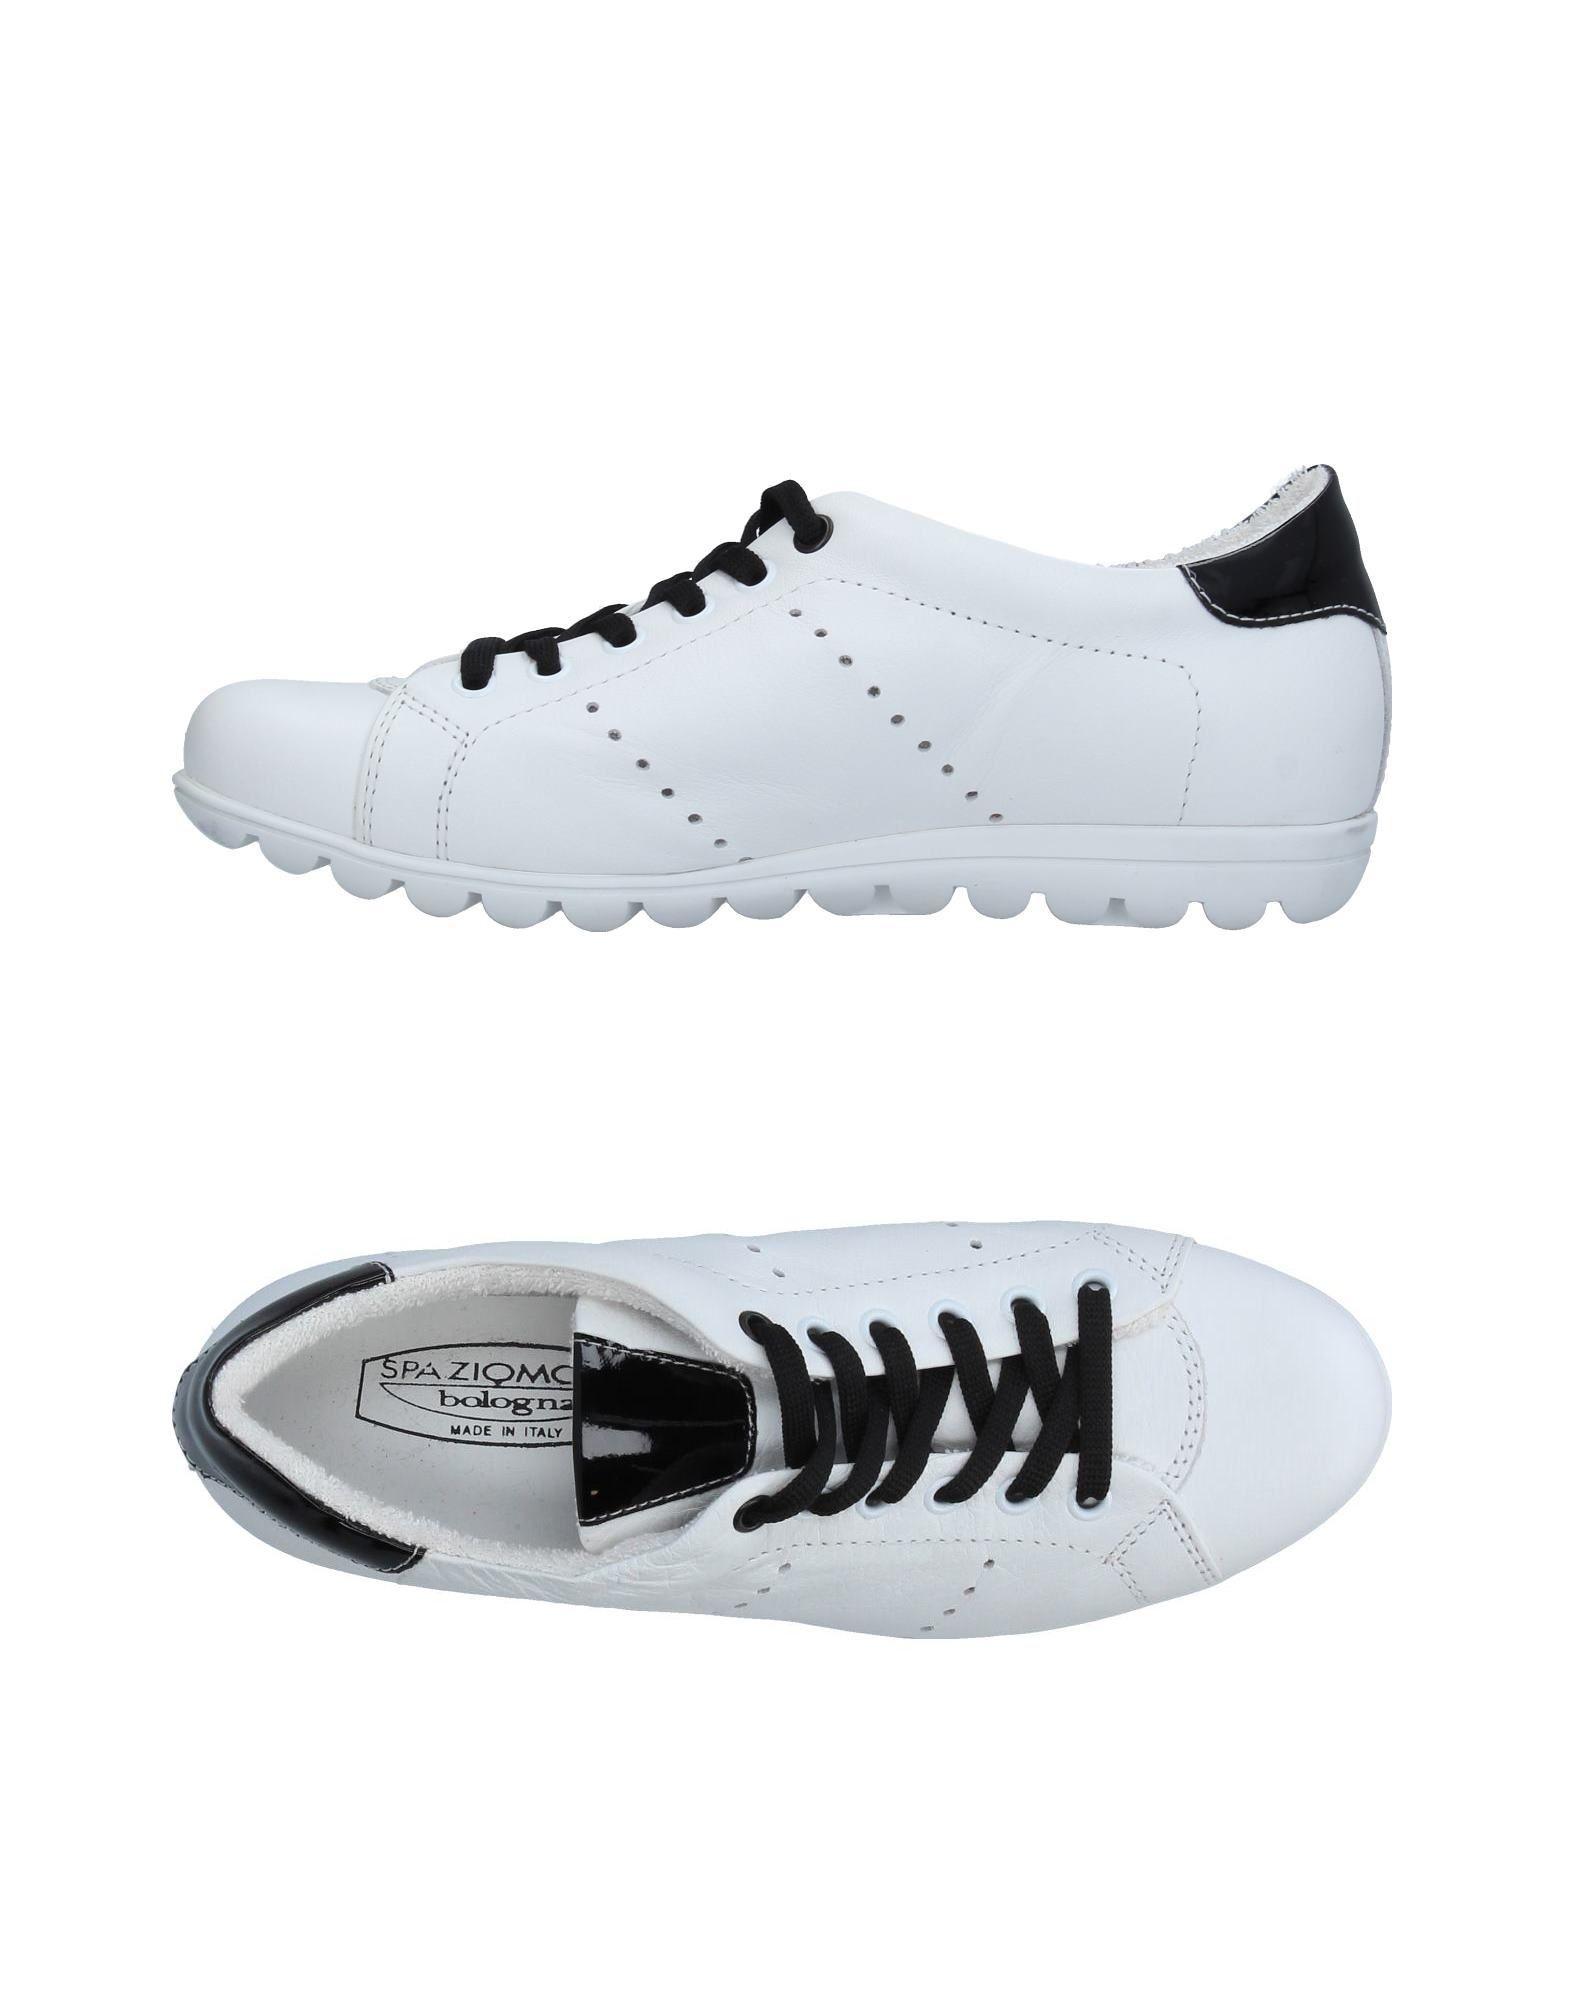 Sneakers Spaziomoda Femme - Sneakers Spaziomoda sur